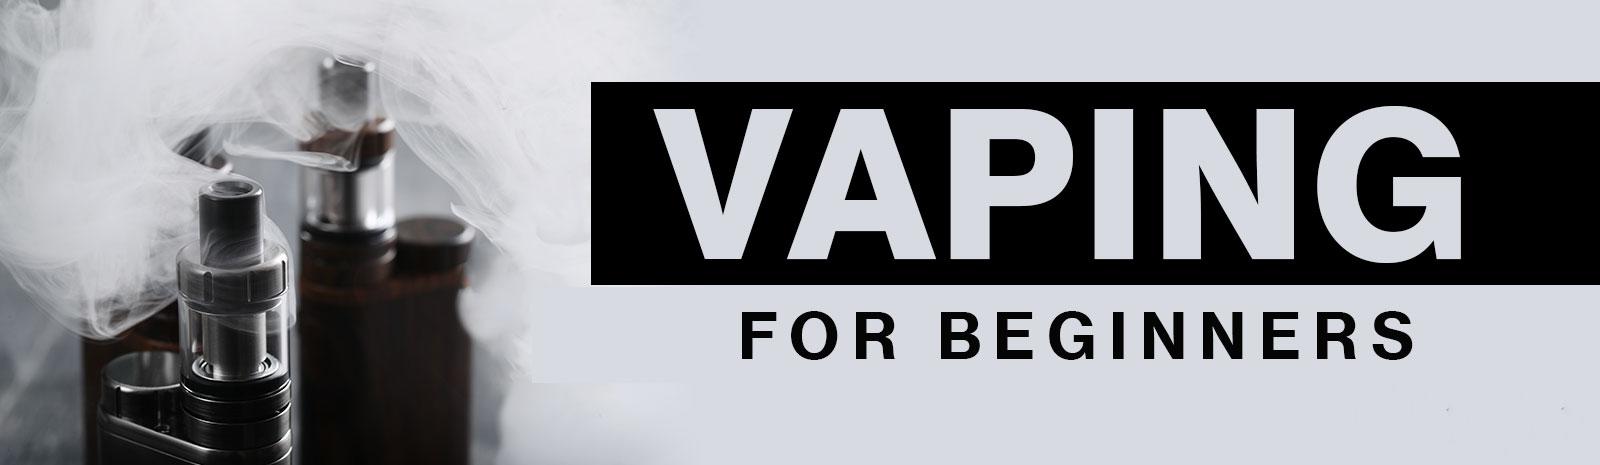 Ecig banner for new vapers